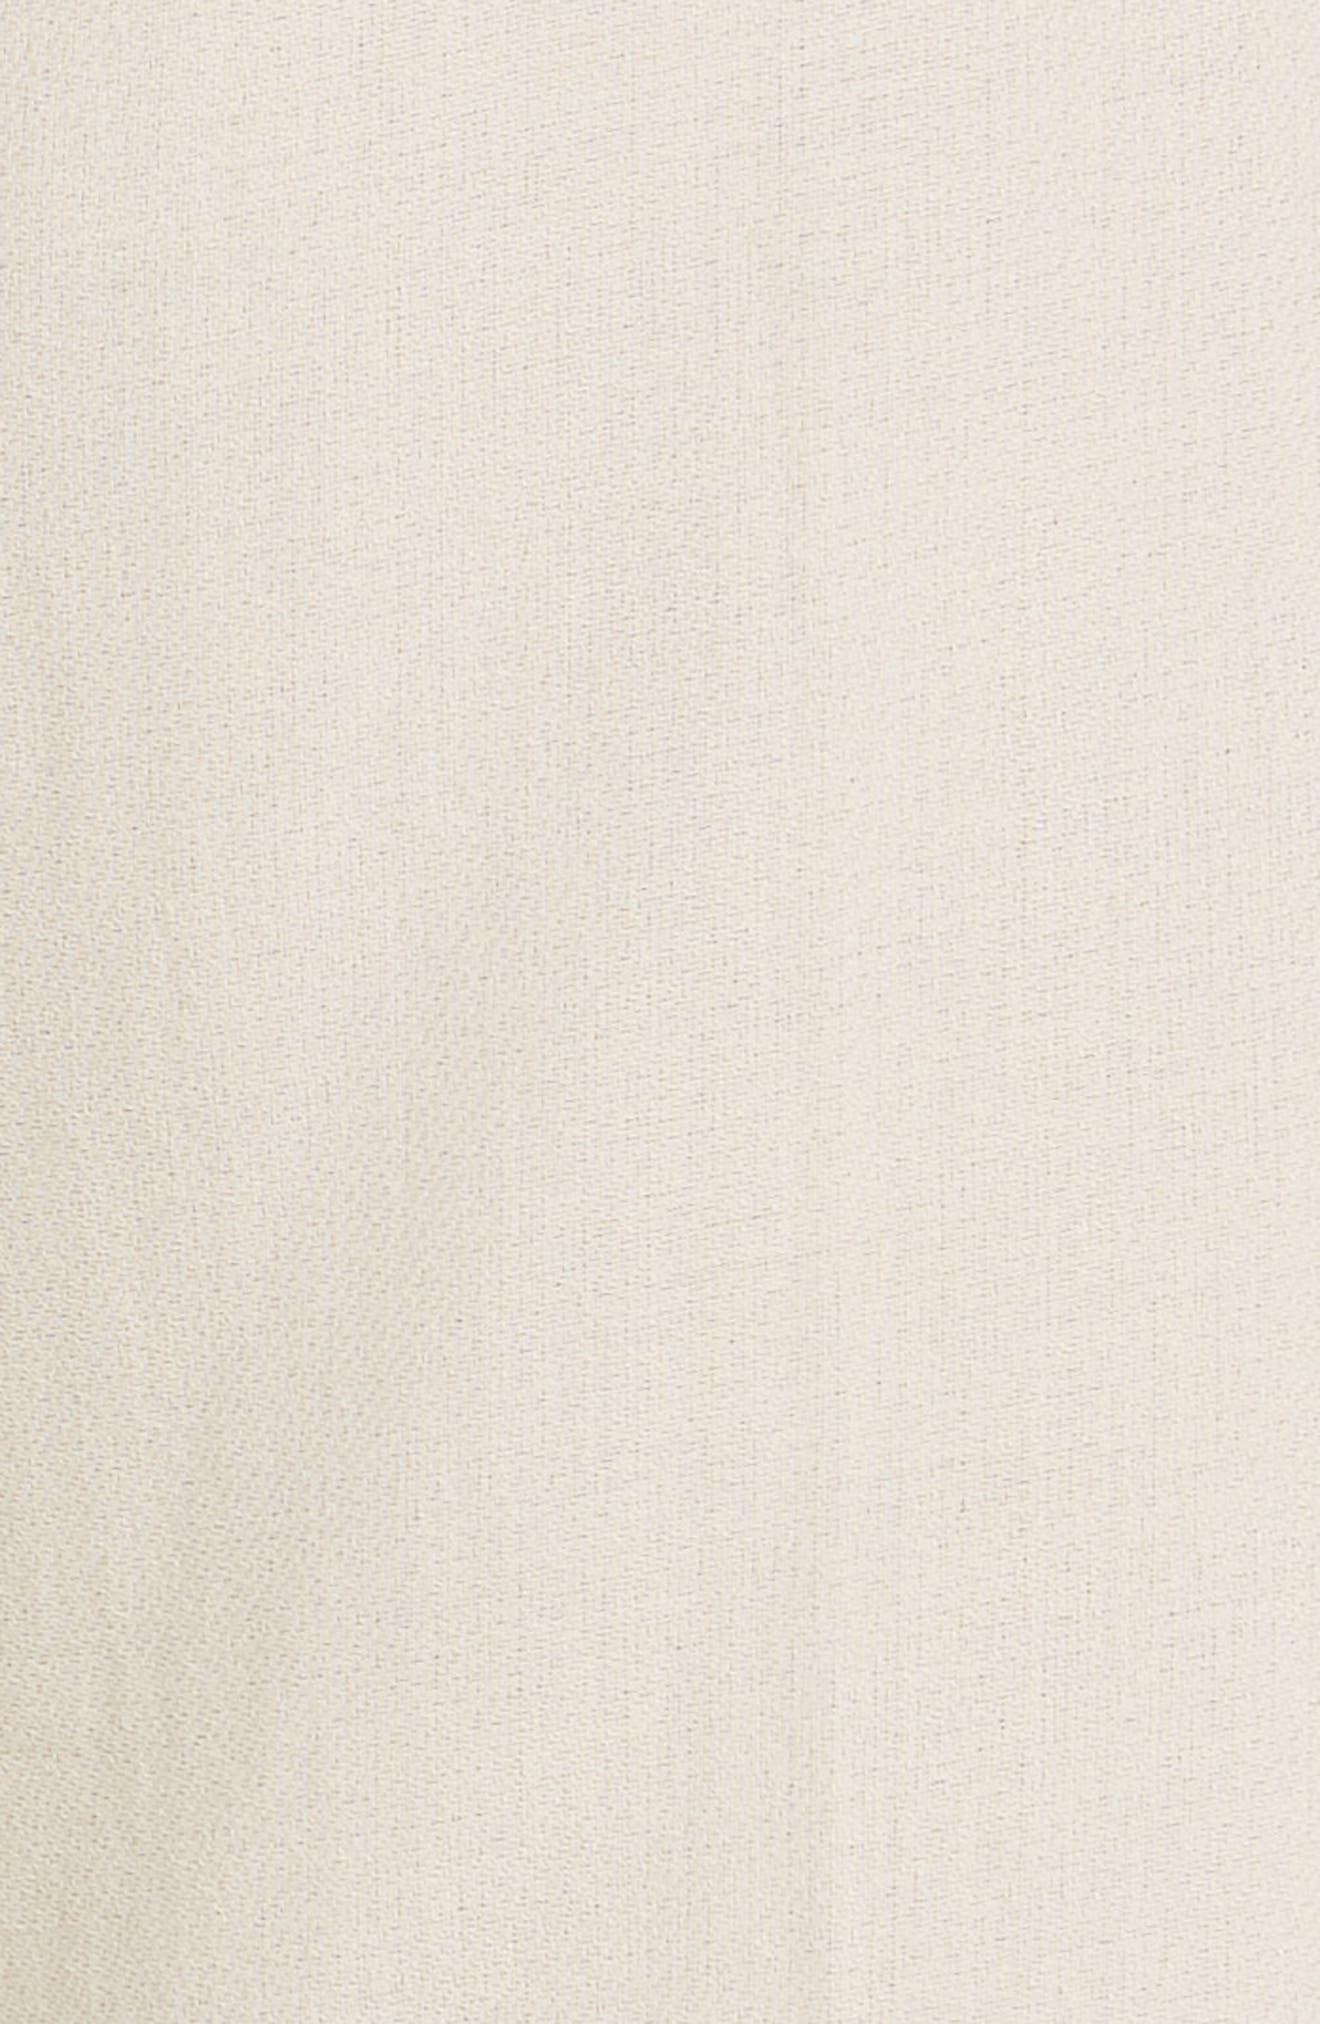 MAX MARA, Cursore Cotton Wide Leg Pants, Alternate thumbnail 5, color, 900